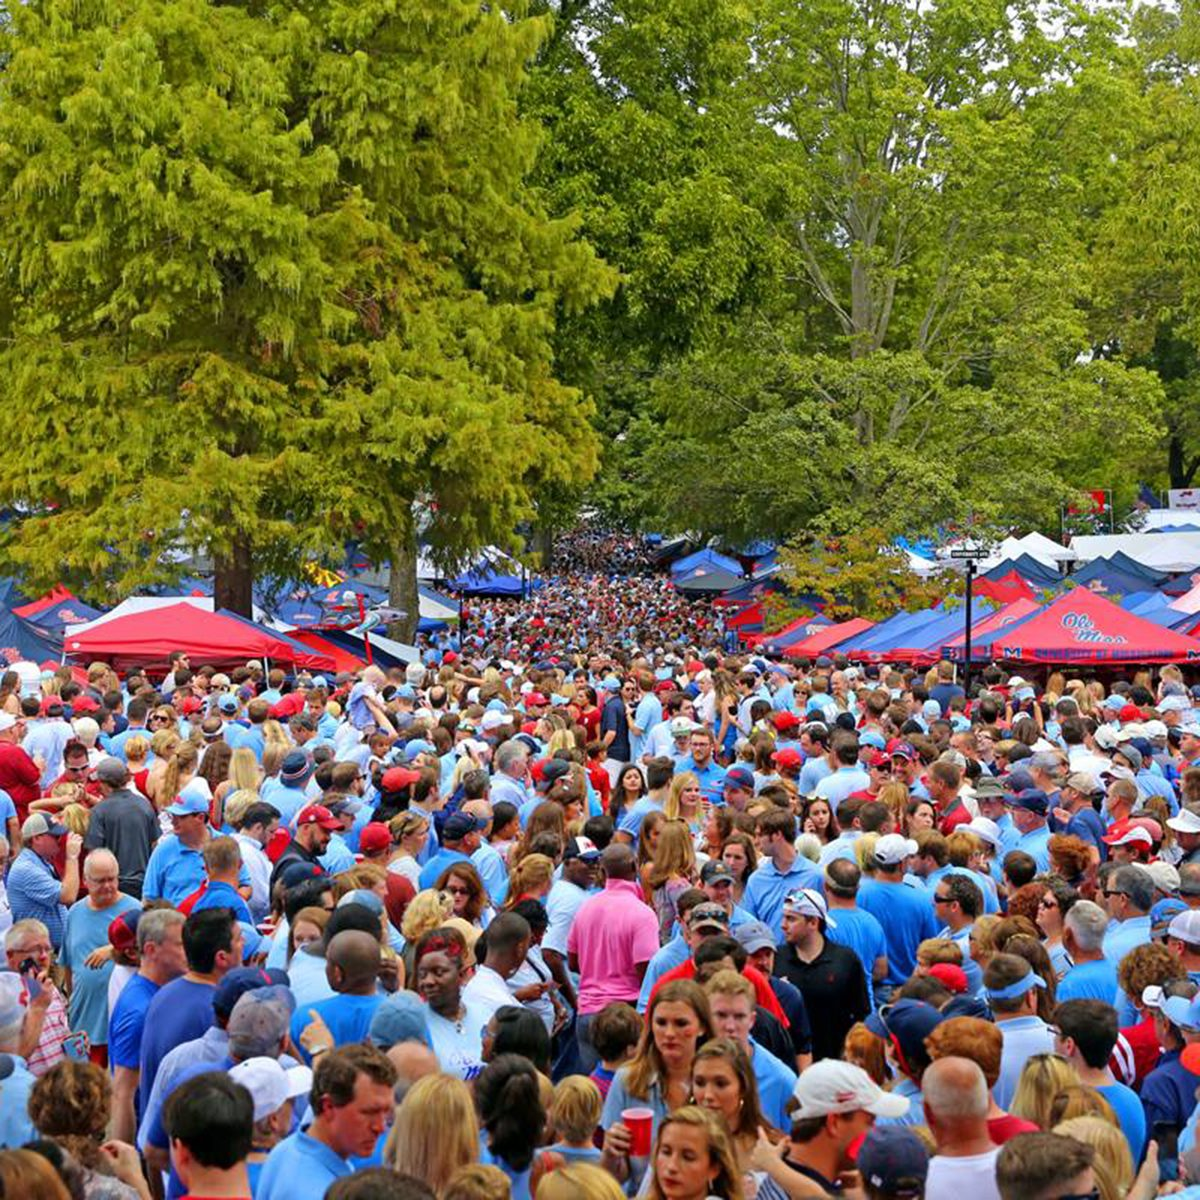 University of Mississippi fan filling the street